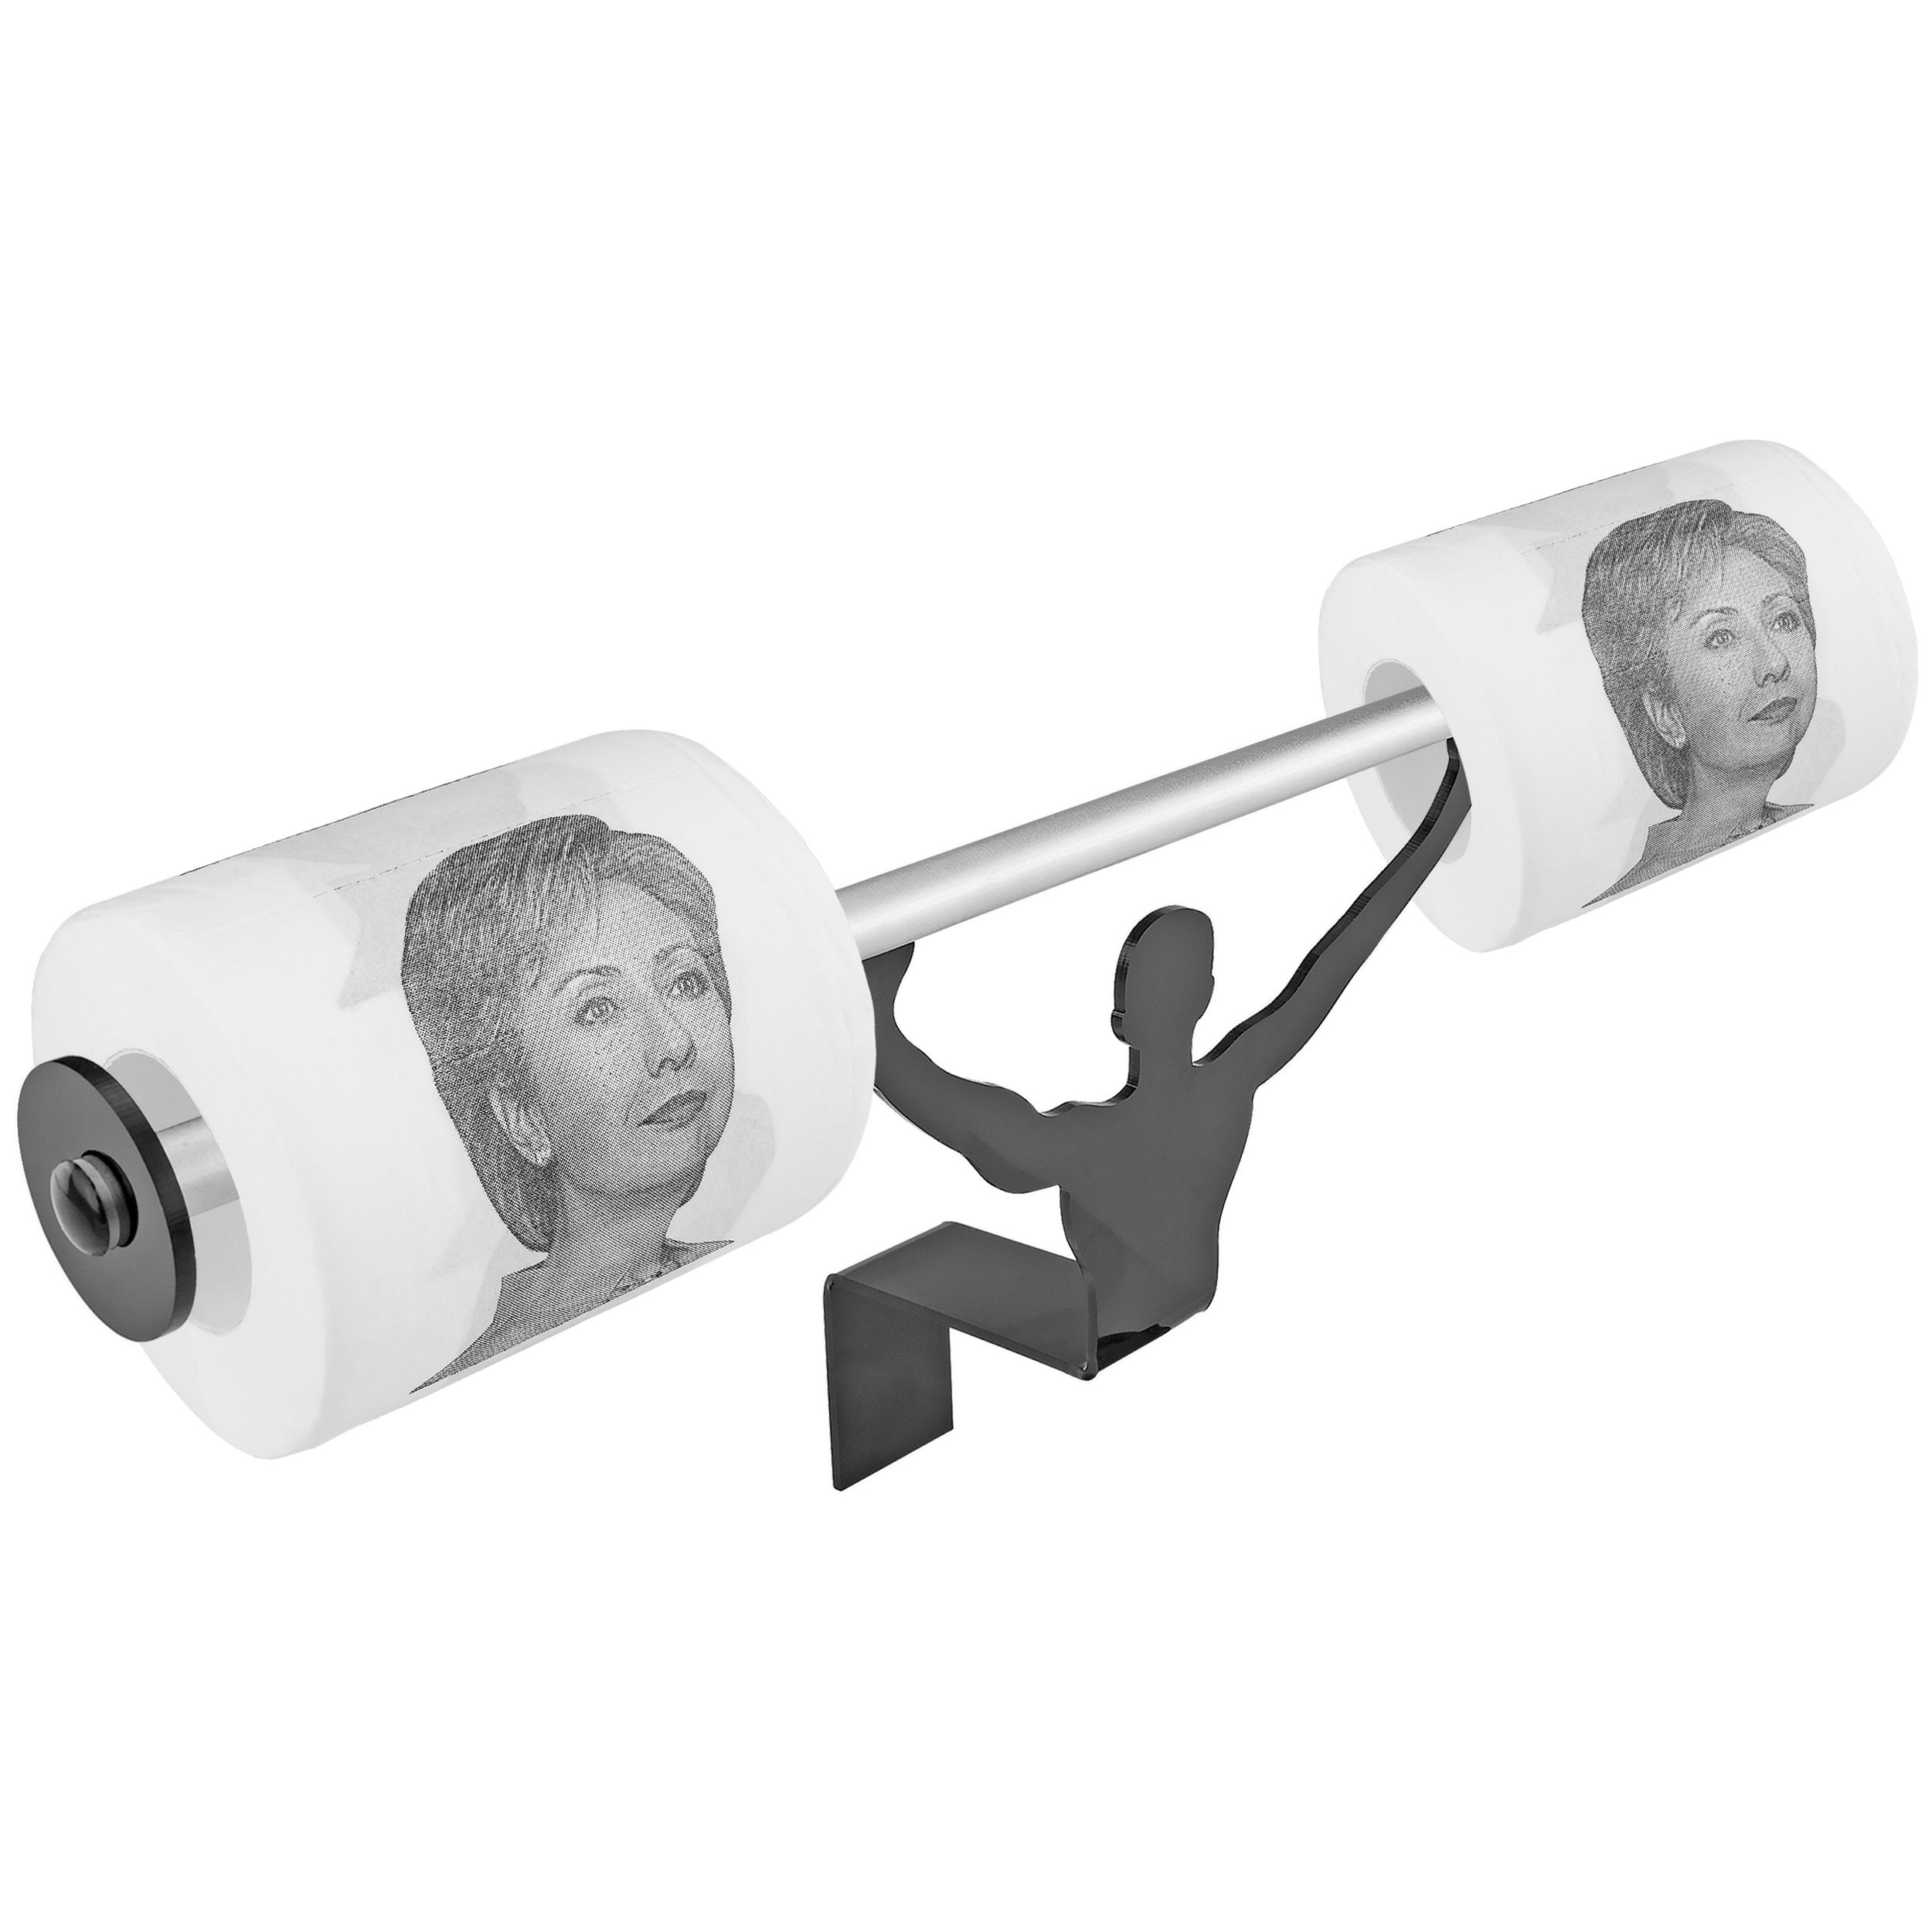 Fairly Odd Novelties Hillary Clinton Toilet Paper W/Strong Man Holder Democrats Political Gift Set